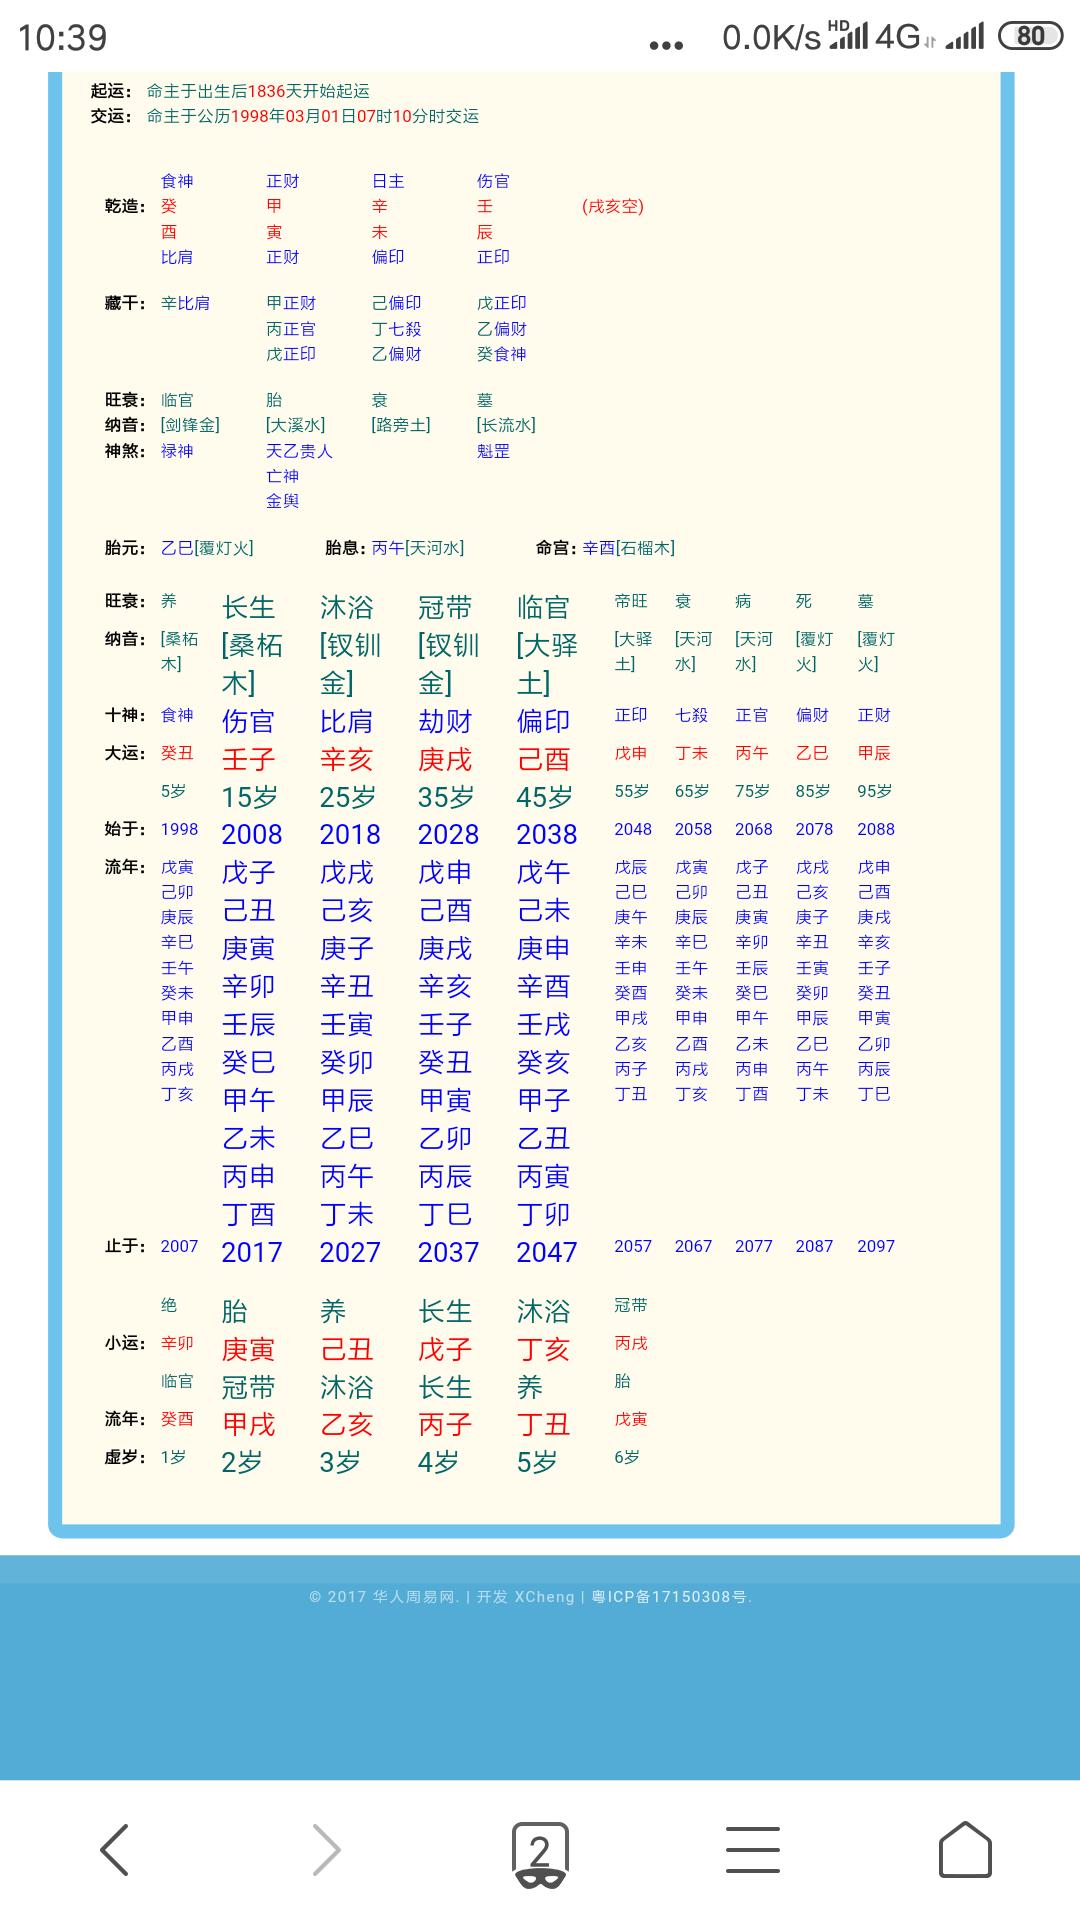 Screenshot_2019-02-06-10-39-36-907_com.android.browser.png